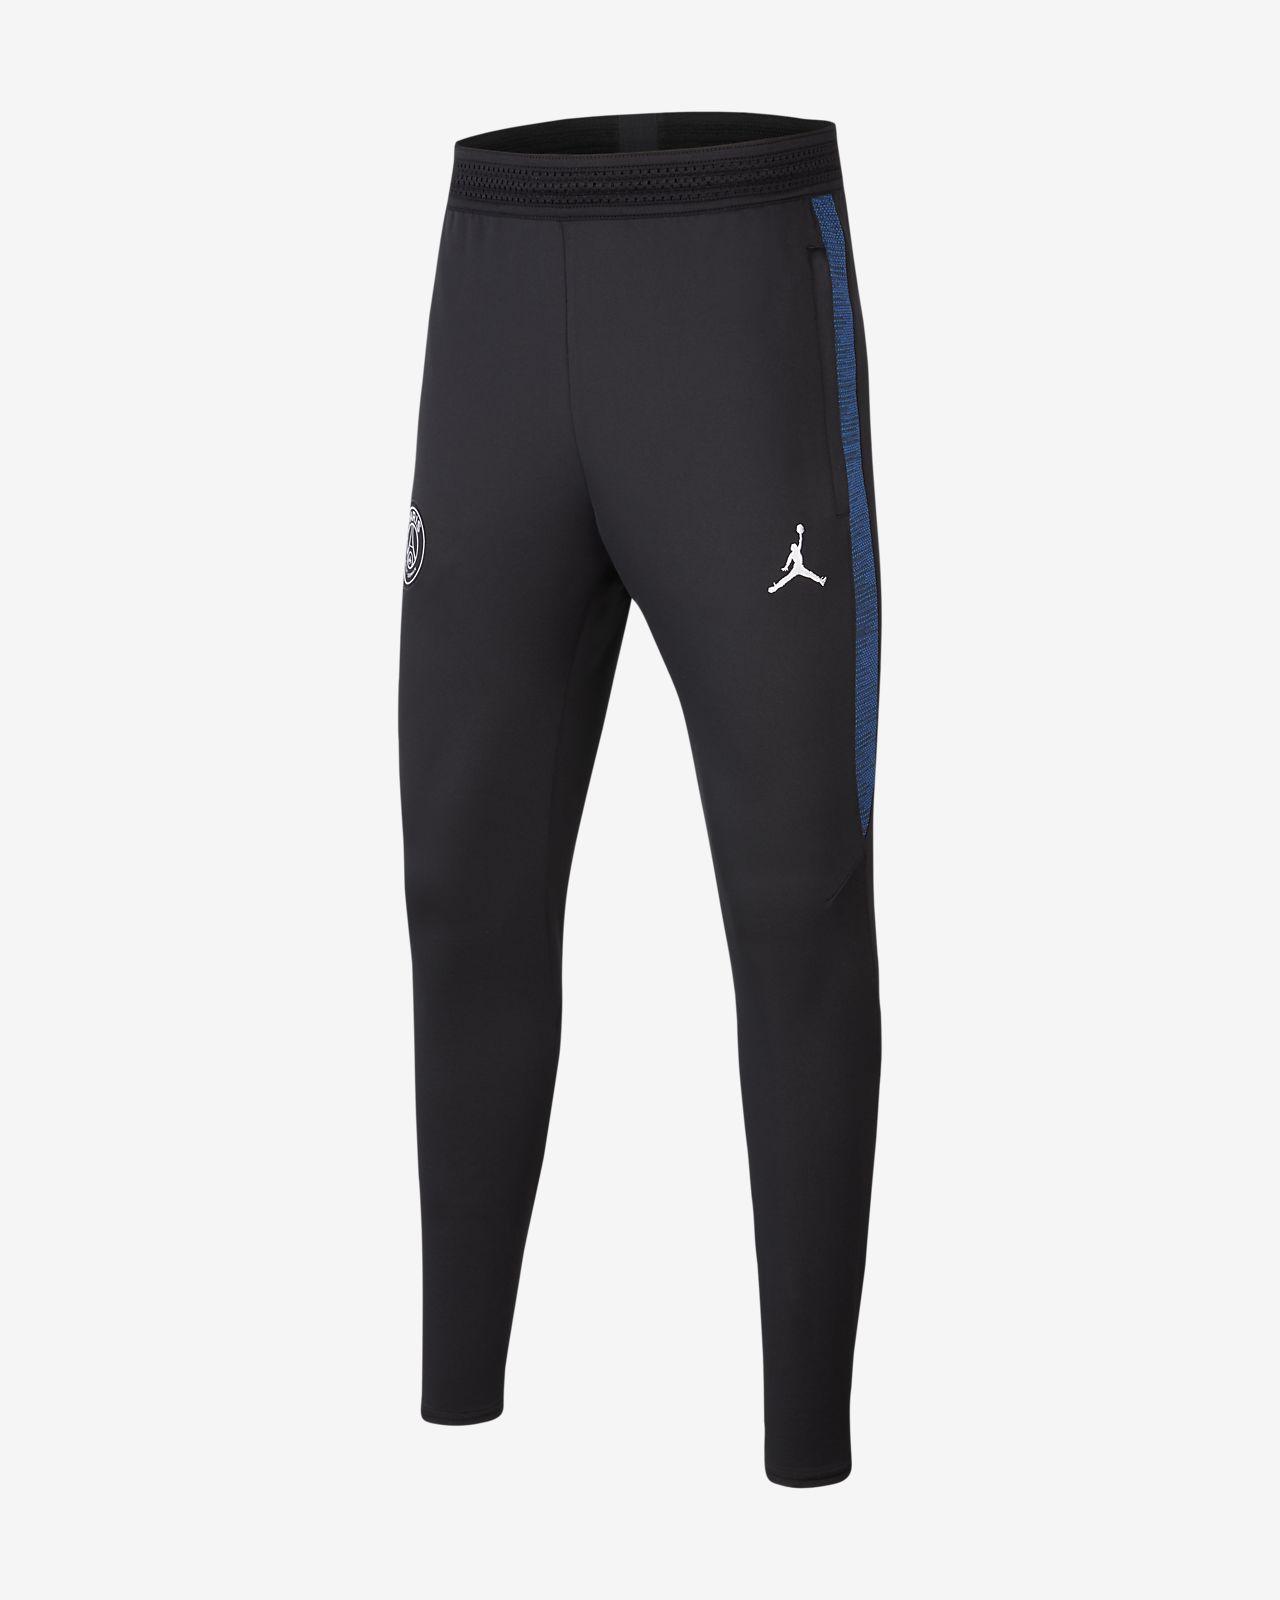 Pantaloni da calcio Jordan x Paris Saint-Germain Strike - Ragazzi